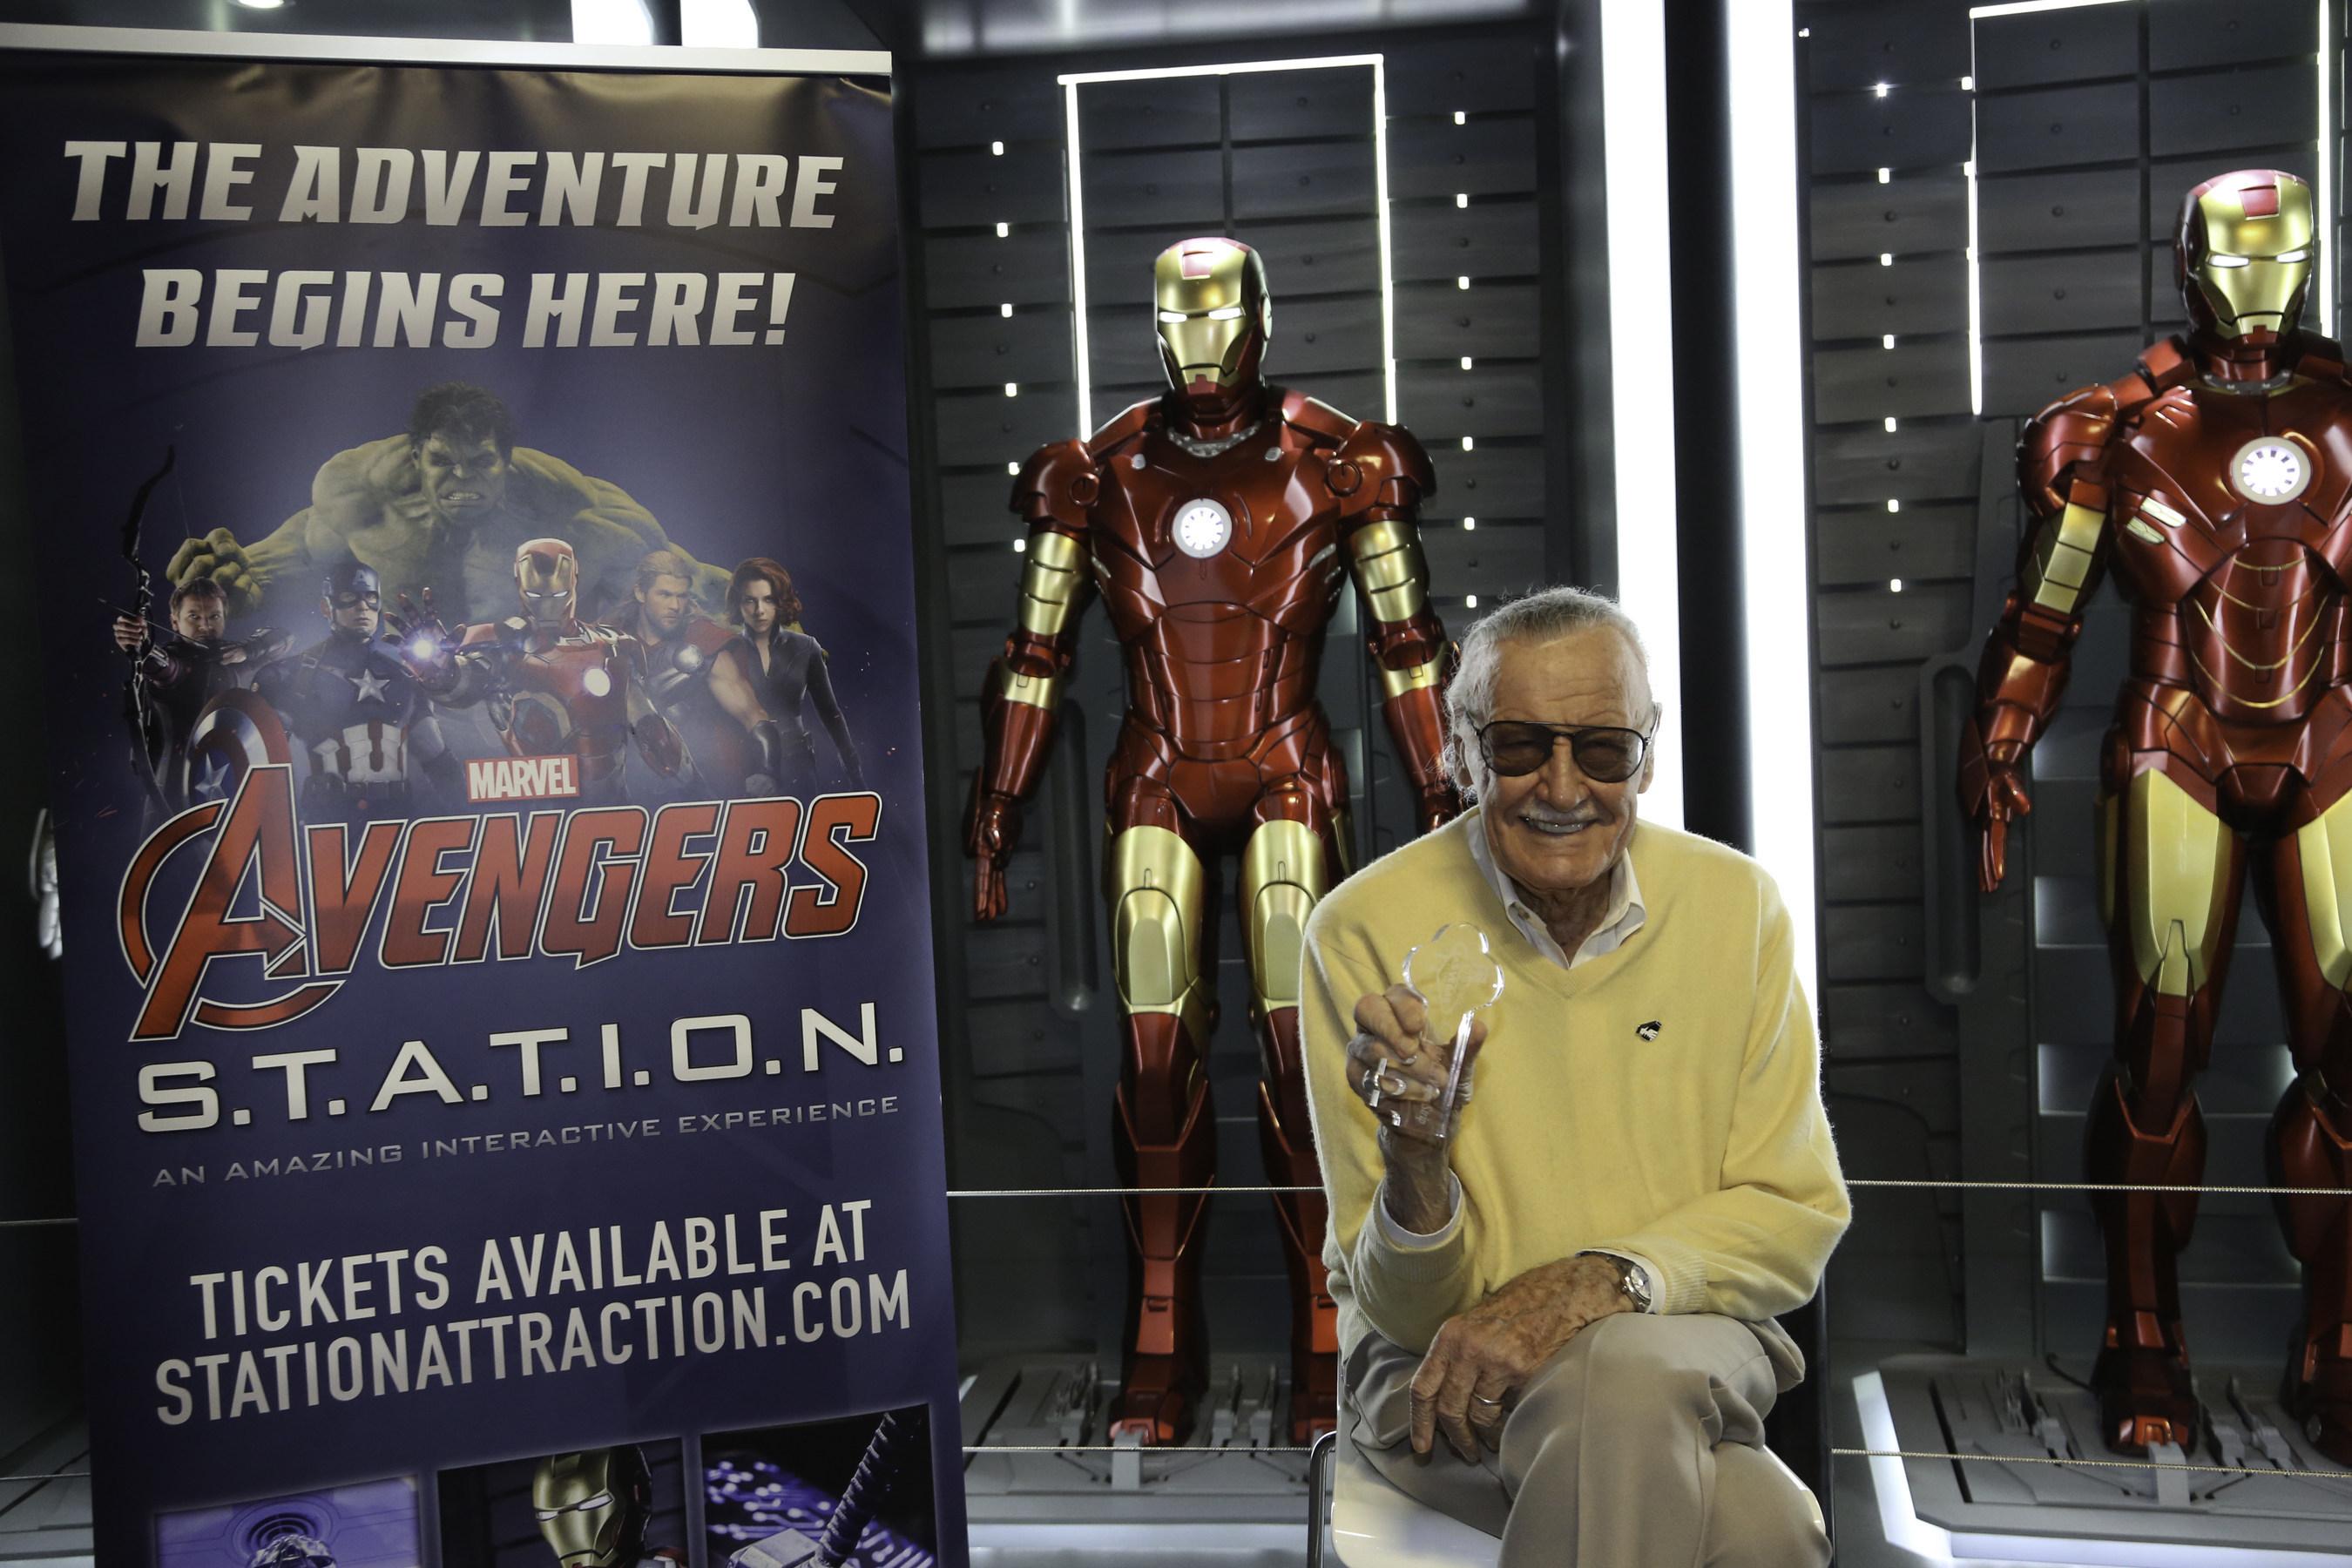 Comic Legend Stan Lee Receives Key To The Famed Las Vegas Strip